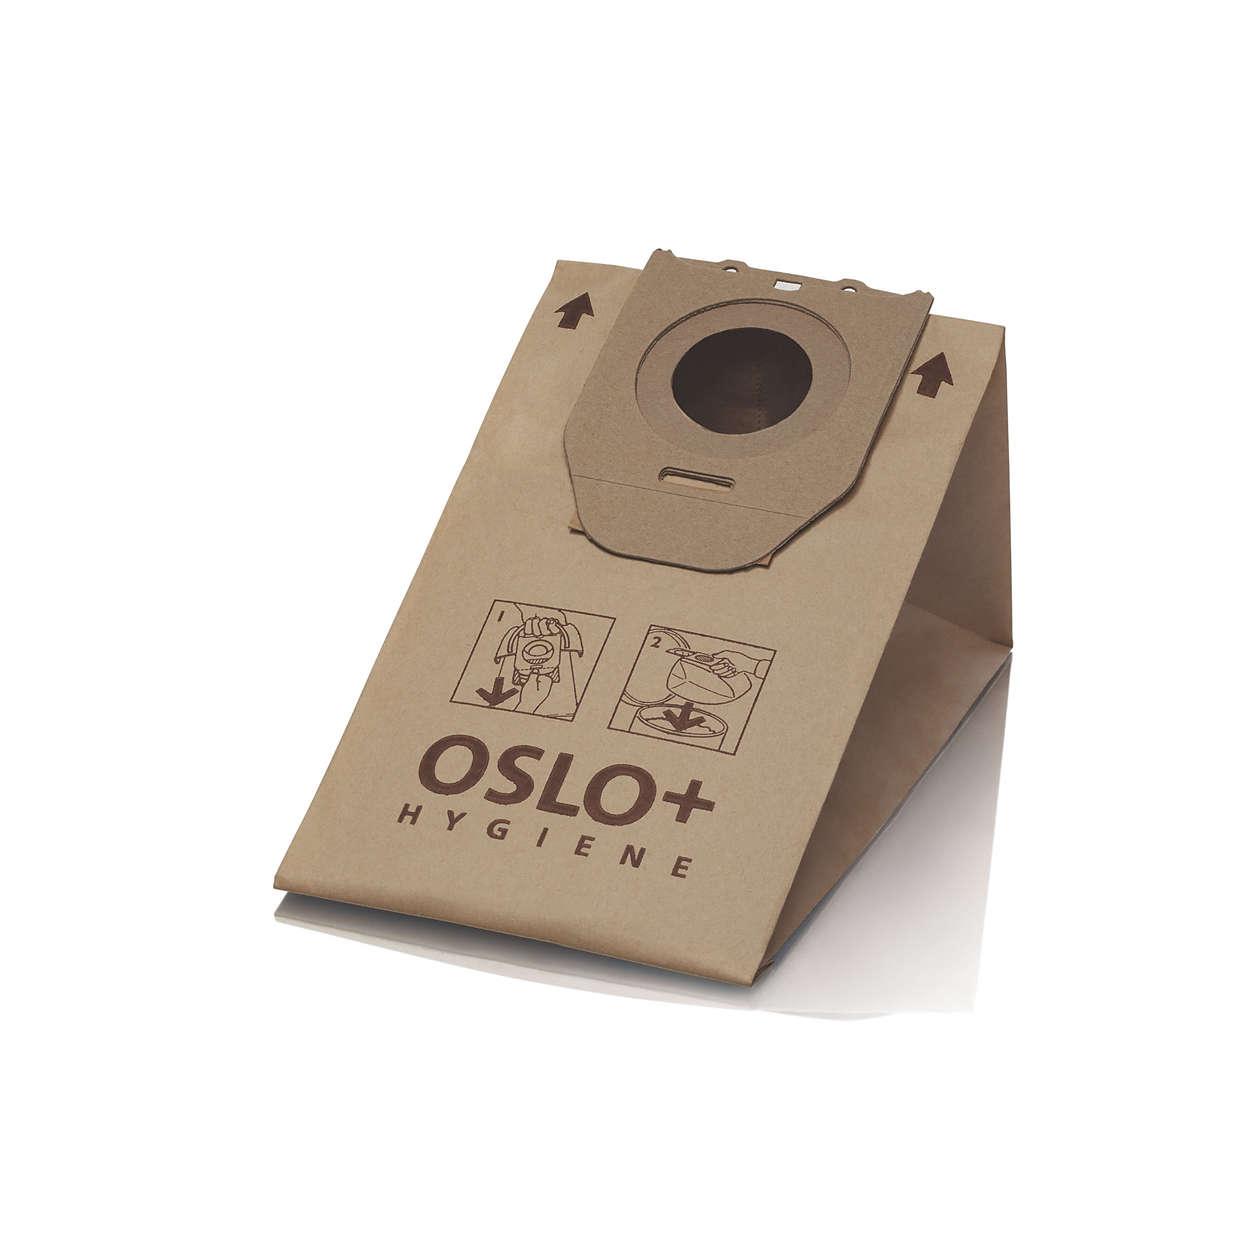 The original Philips dustbag